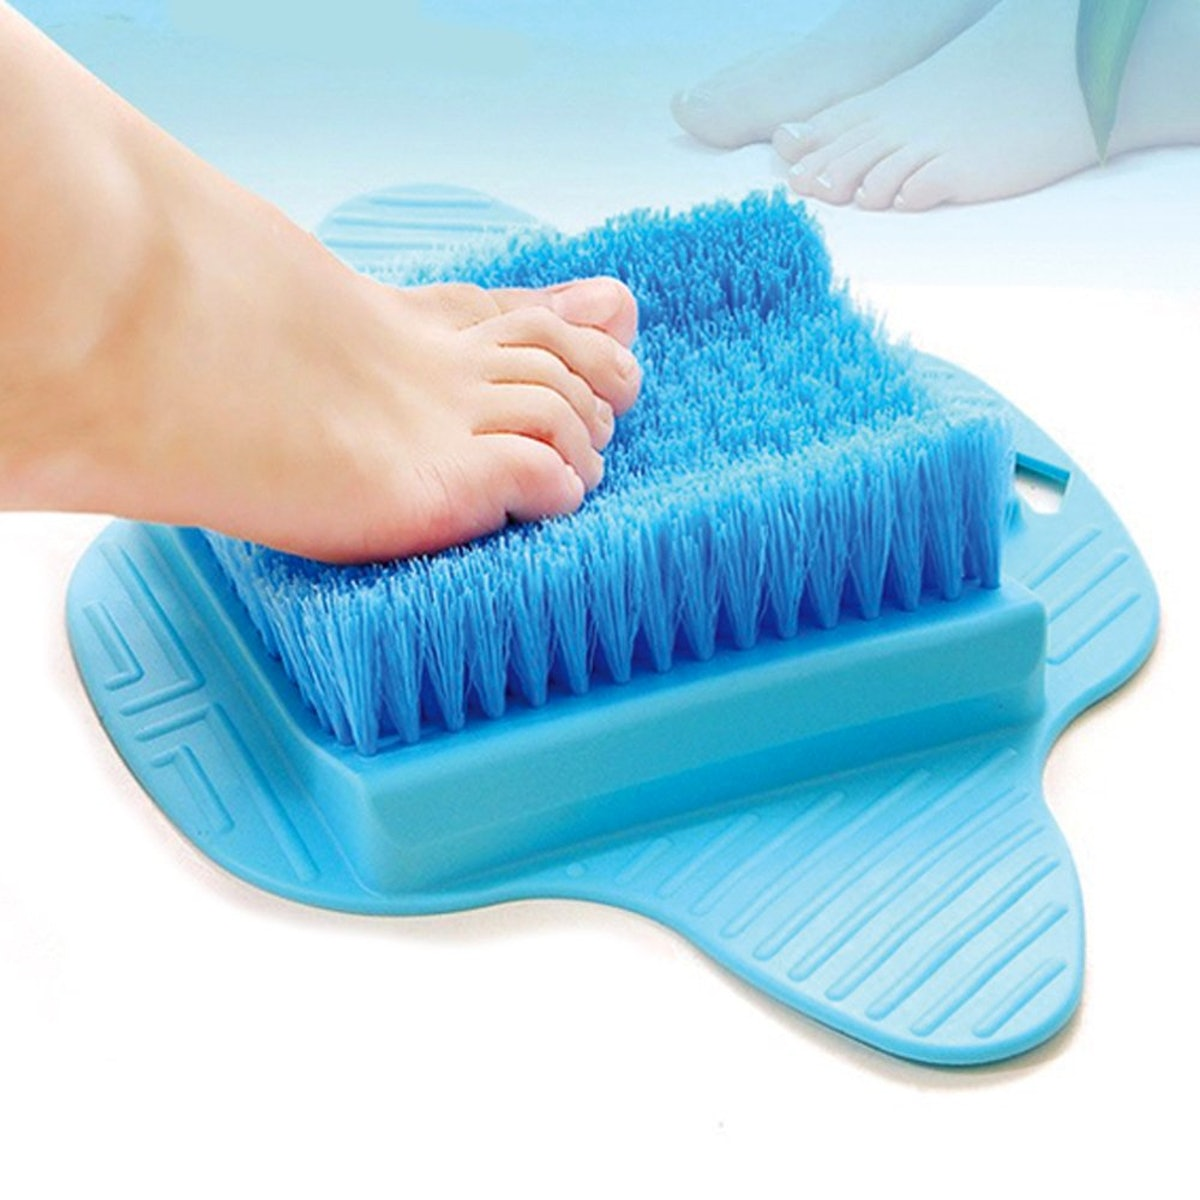 Bath Blossom Foot Scrubber Brush